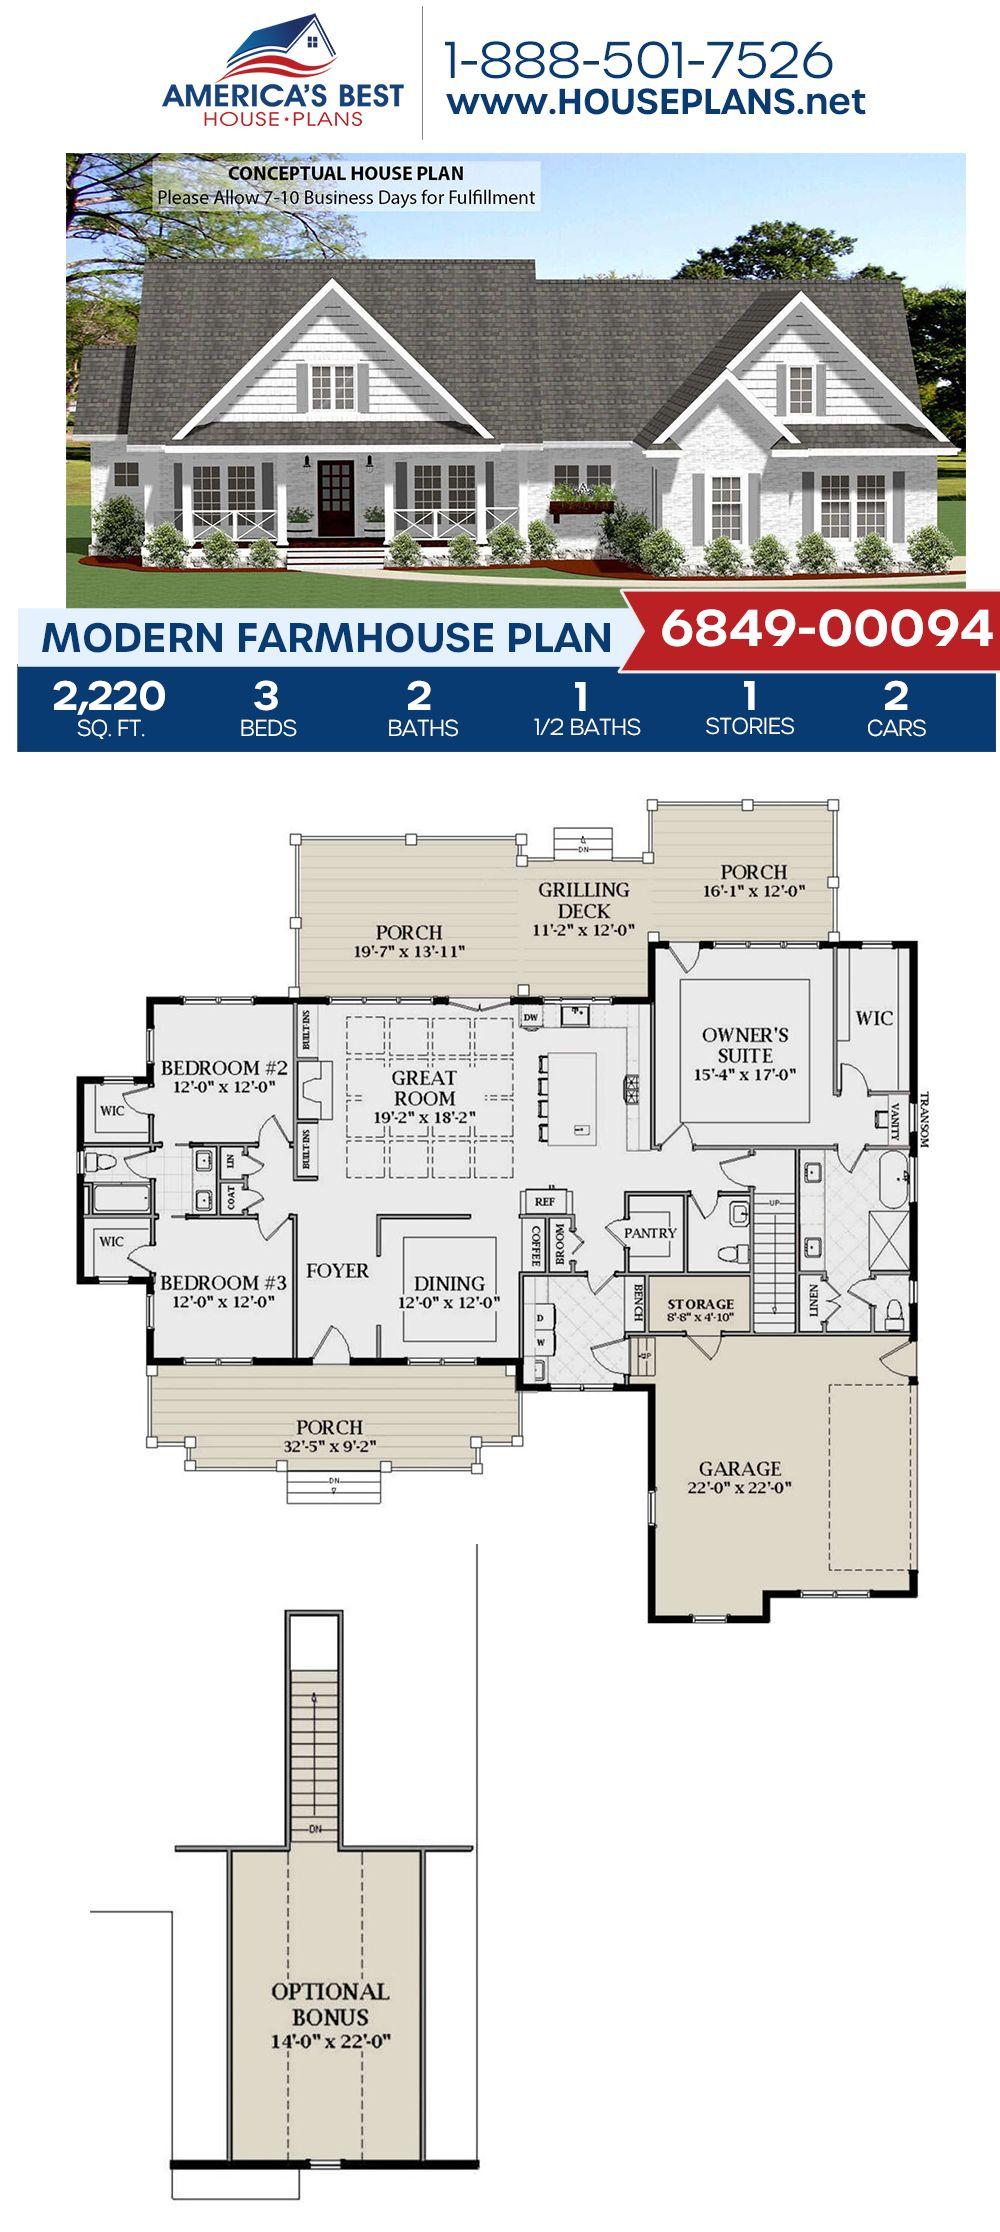 House Plan 6849 00094 Modern Farmhouse Plan 2 220 Square Feet 3 Bedrooms 2 5 Bathrooms House Plans Farmhouse Modern Farmhouse Plans Farmhouse Plans